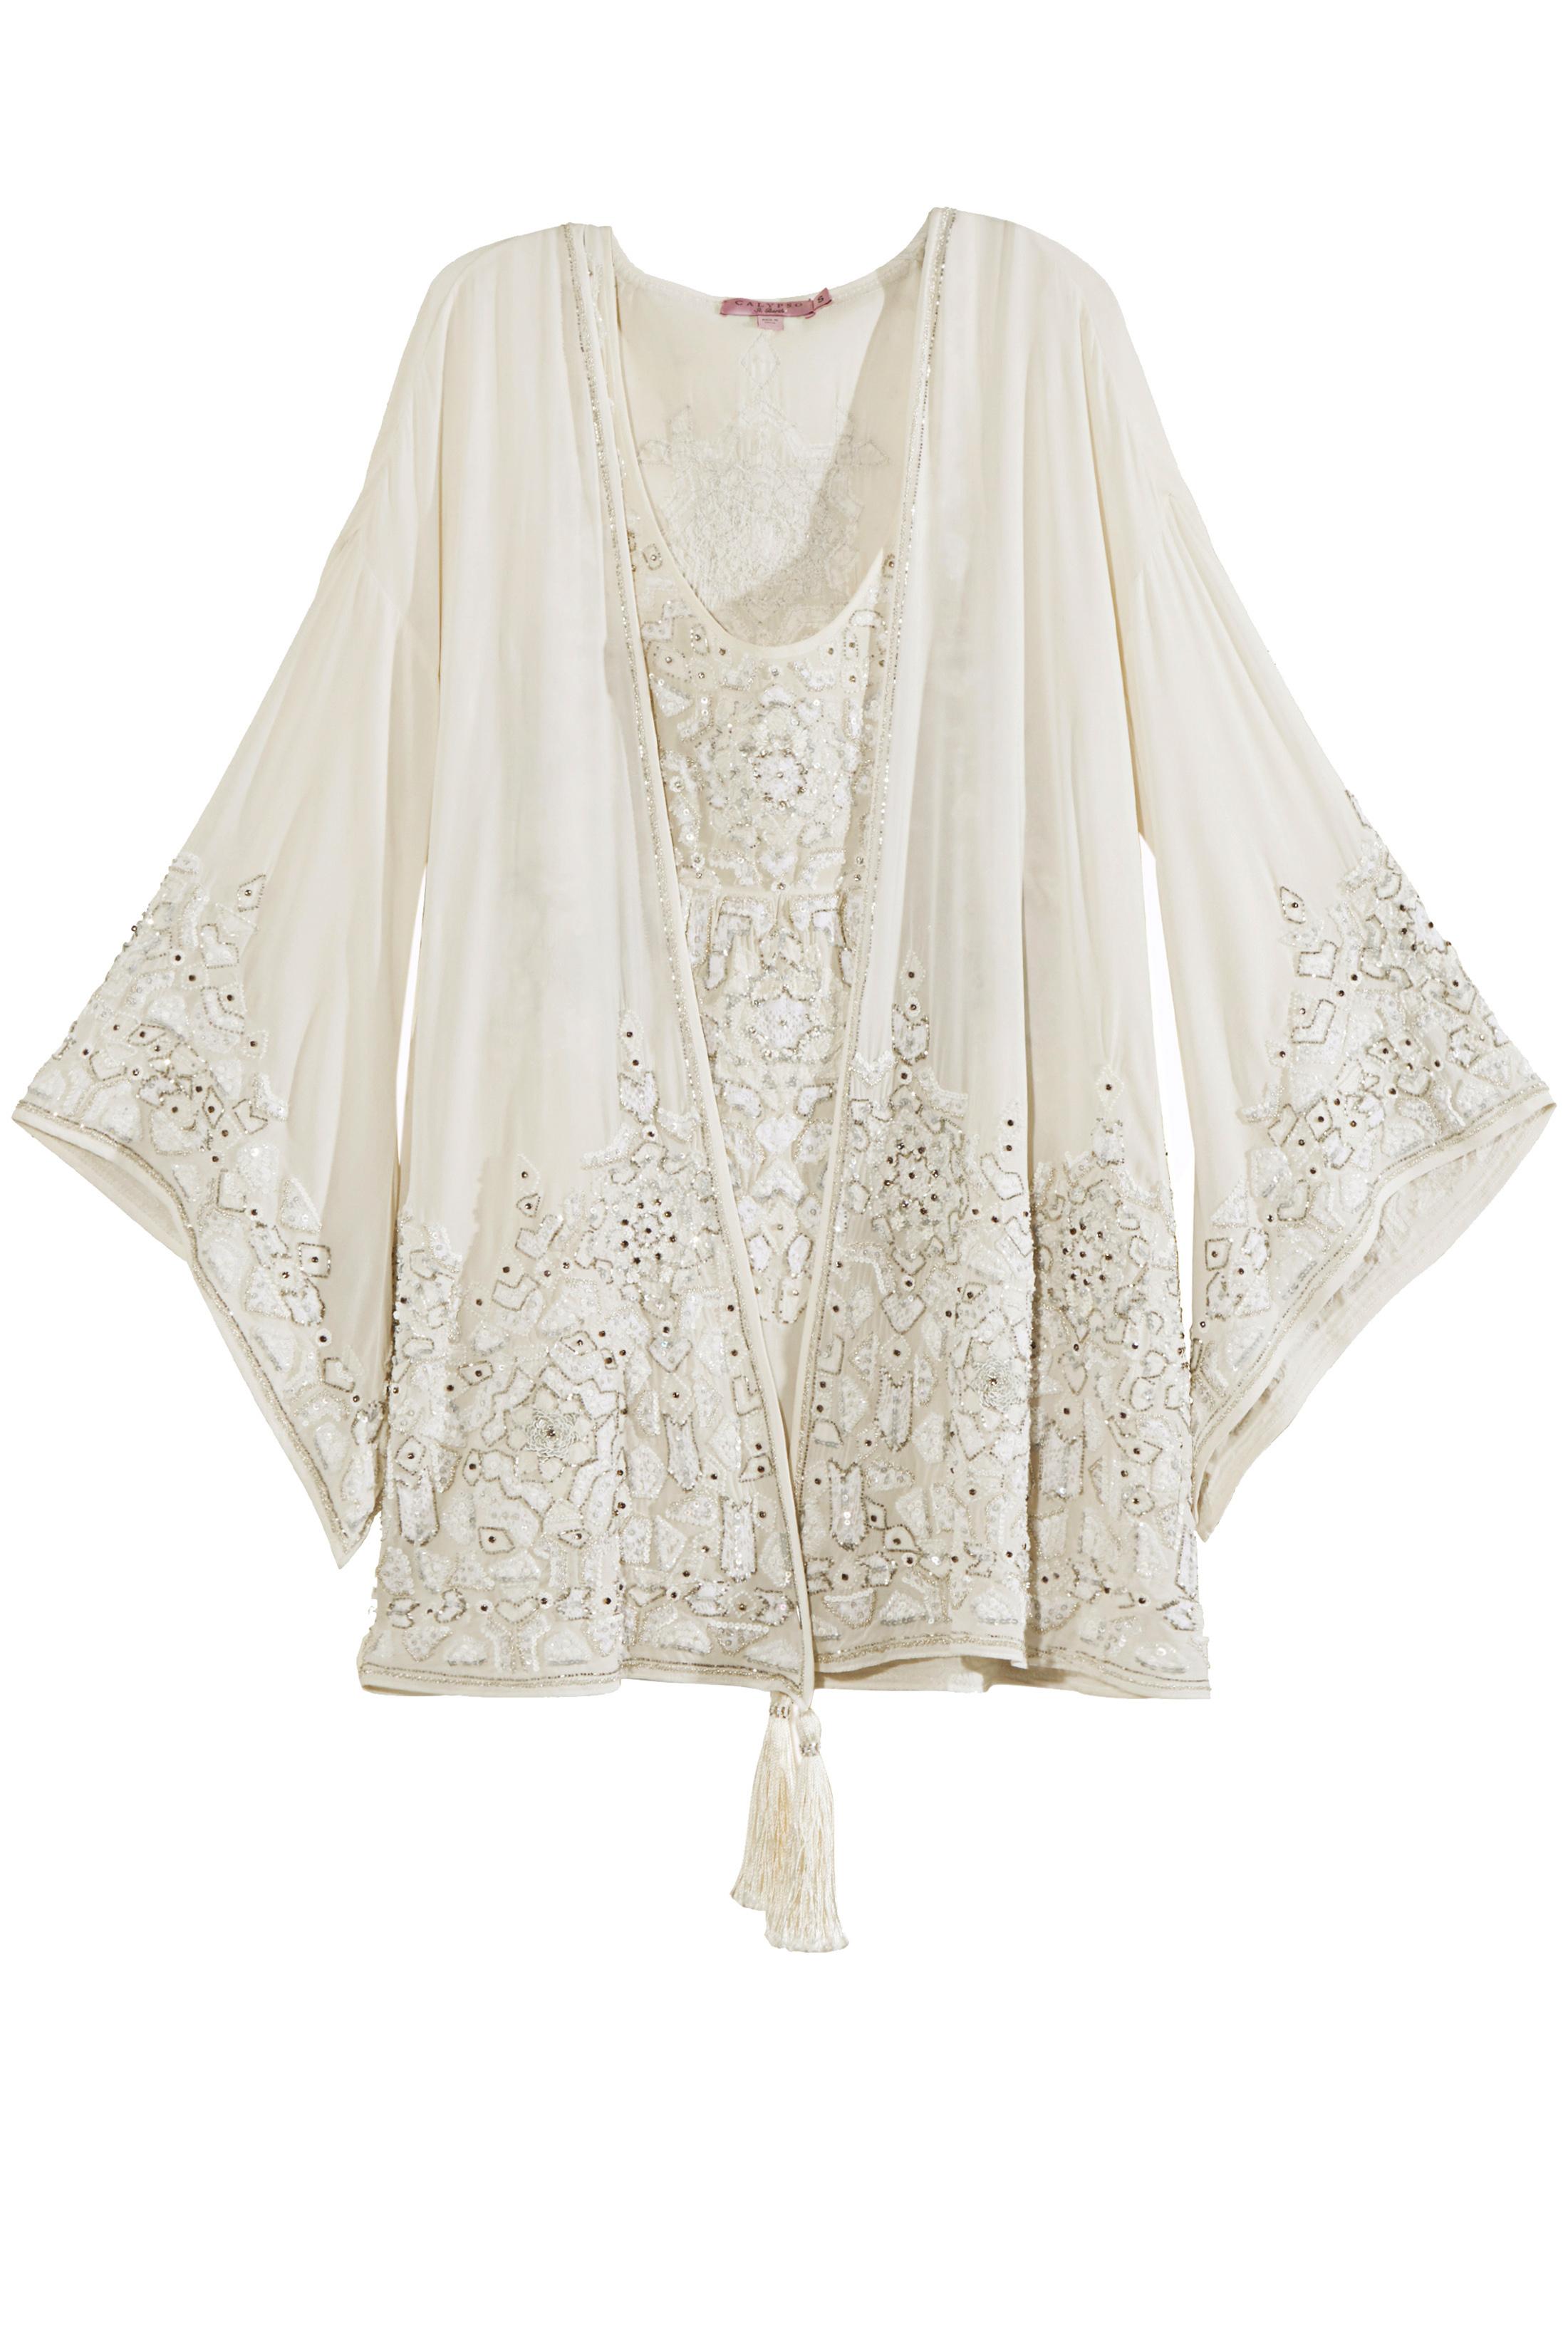 calypso-st-barth-bridal-niba-jacket-0315.jpg